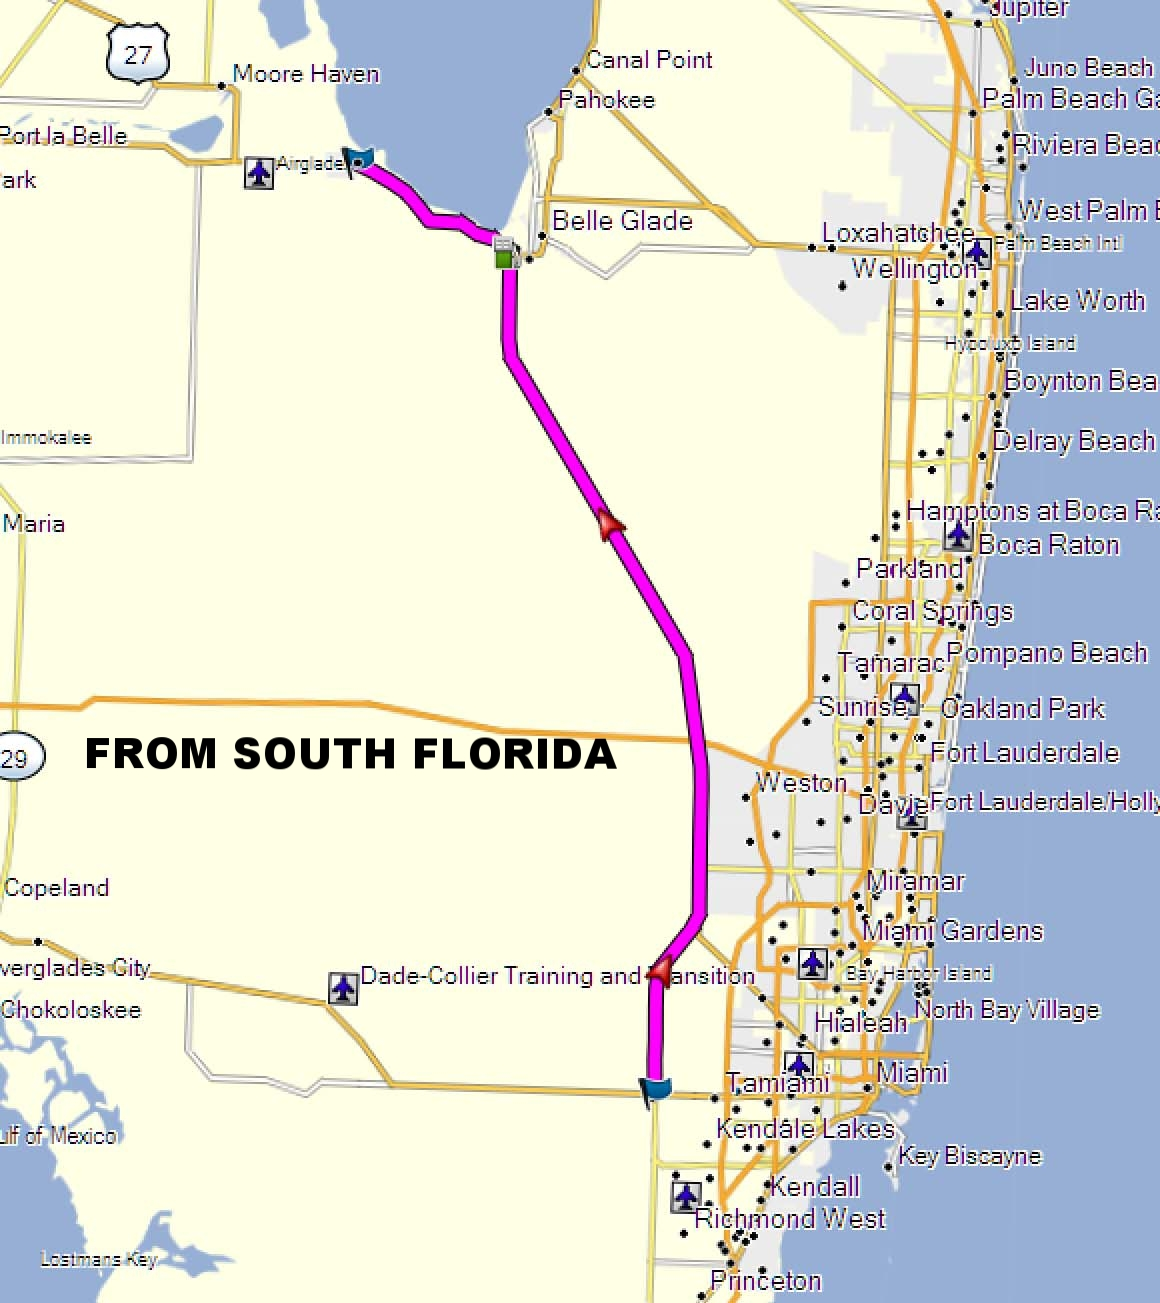 South FL Chapter Map to Scotty's Tiki Bar Clewiston FL.jpg